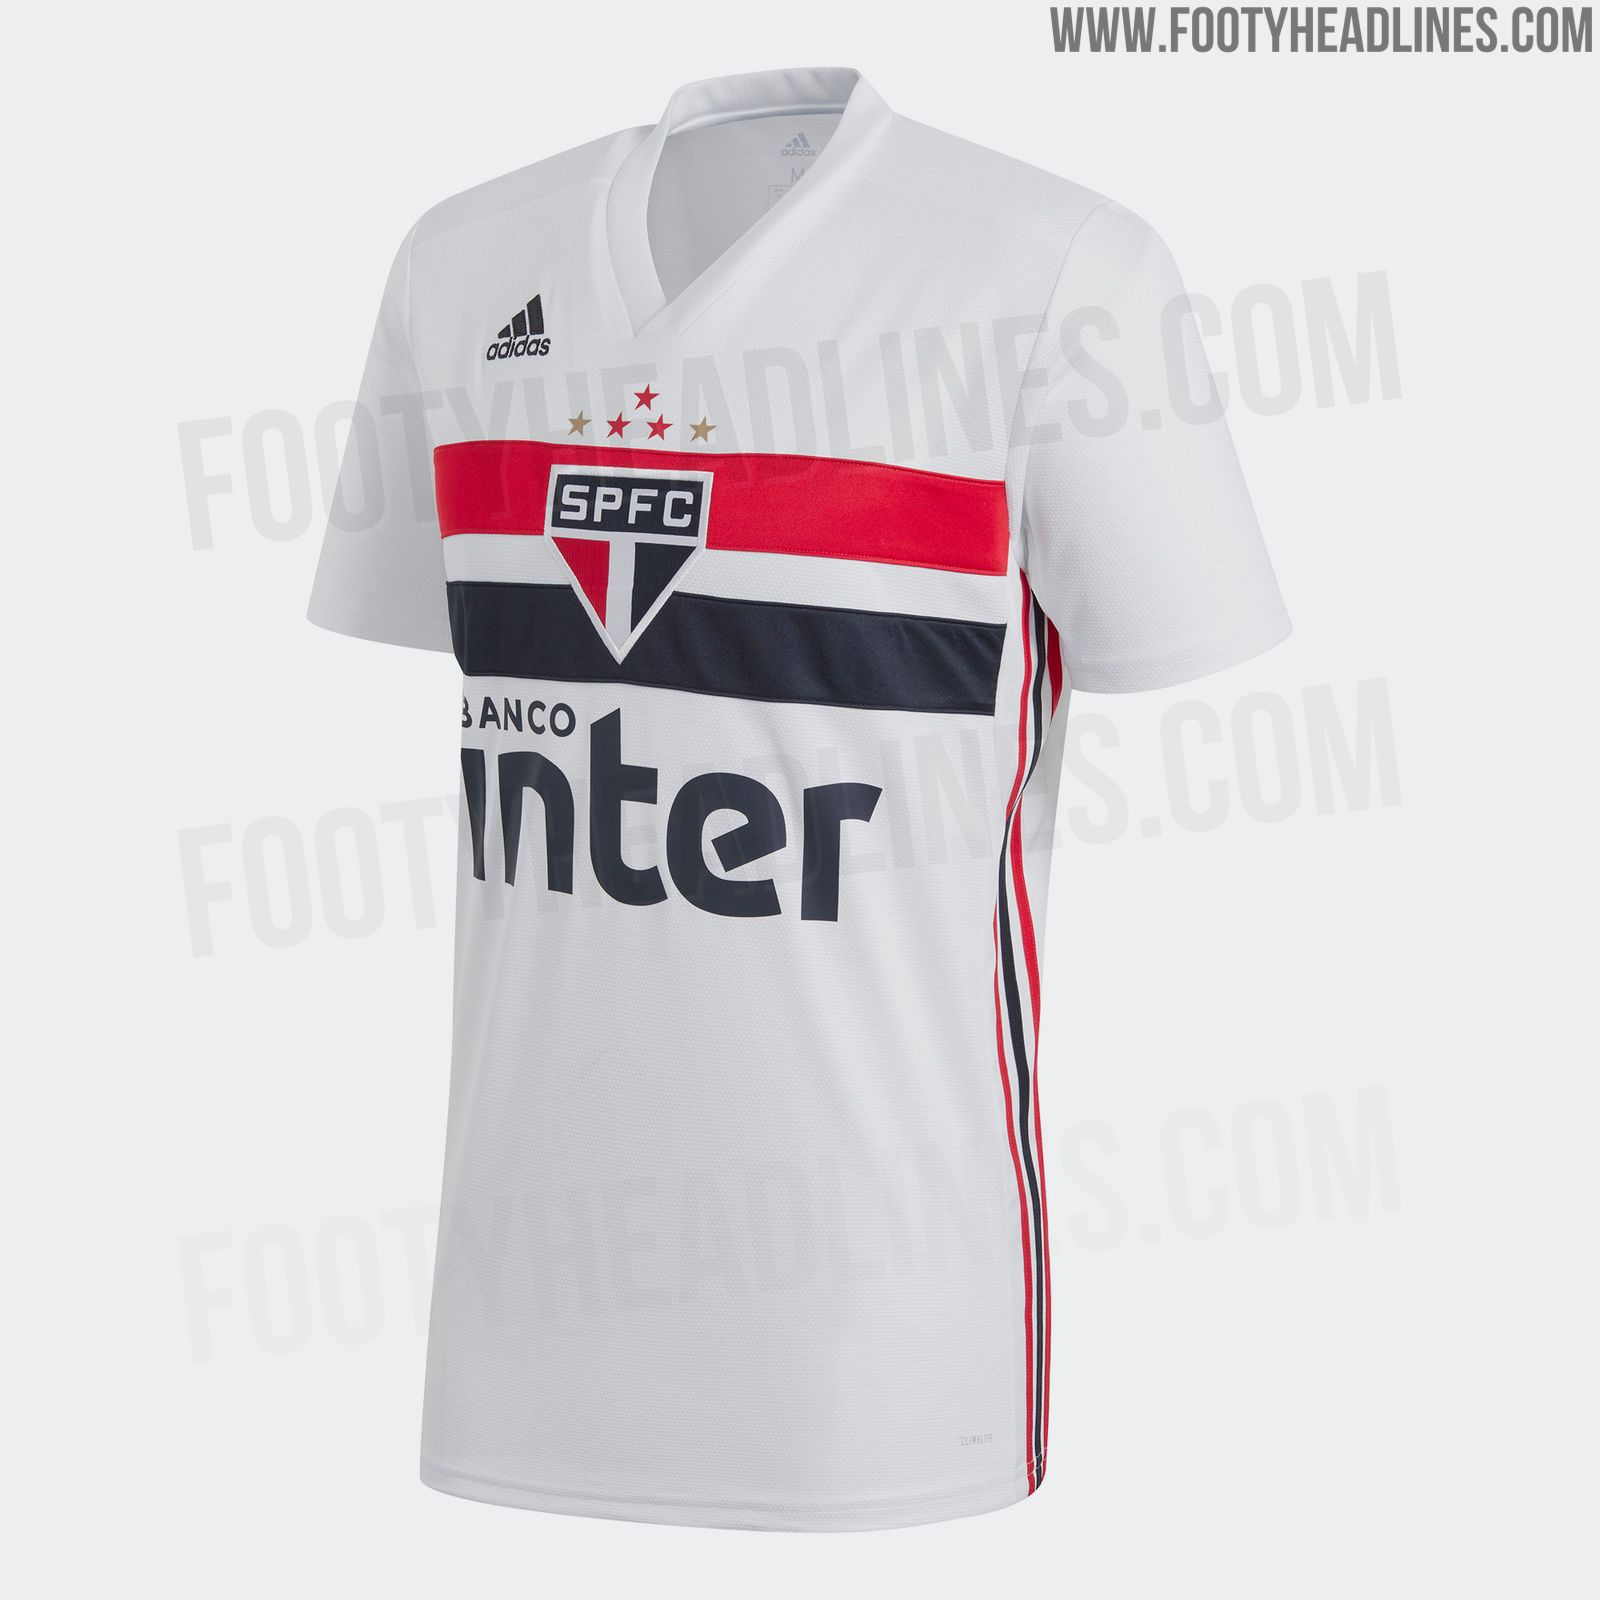 sao-paulo-19-20-home-kit-2.jpg